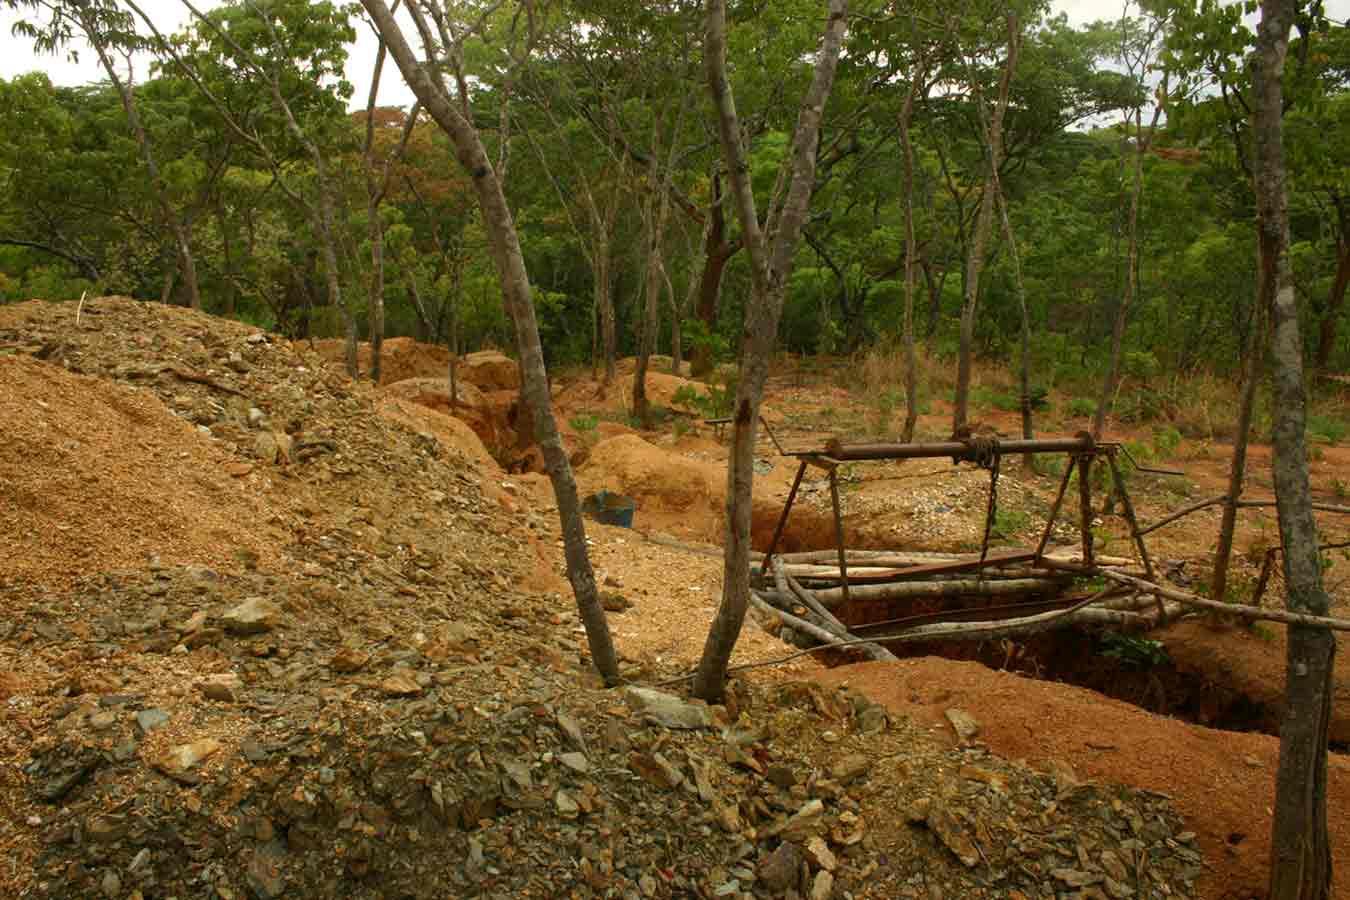 Soil disturbance after gold mining activities